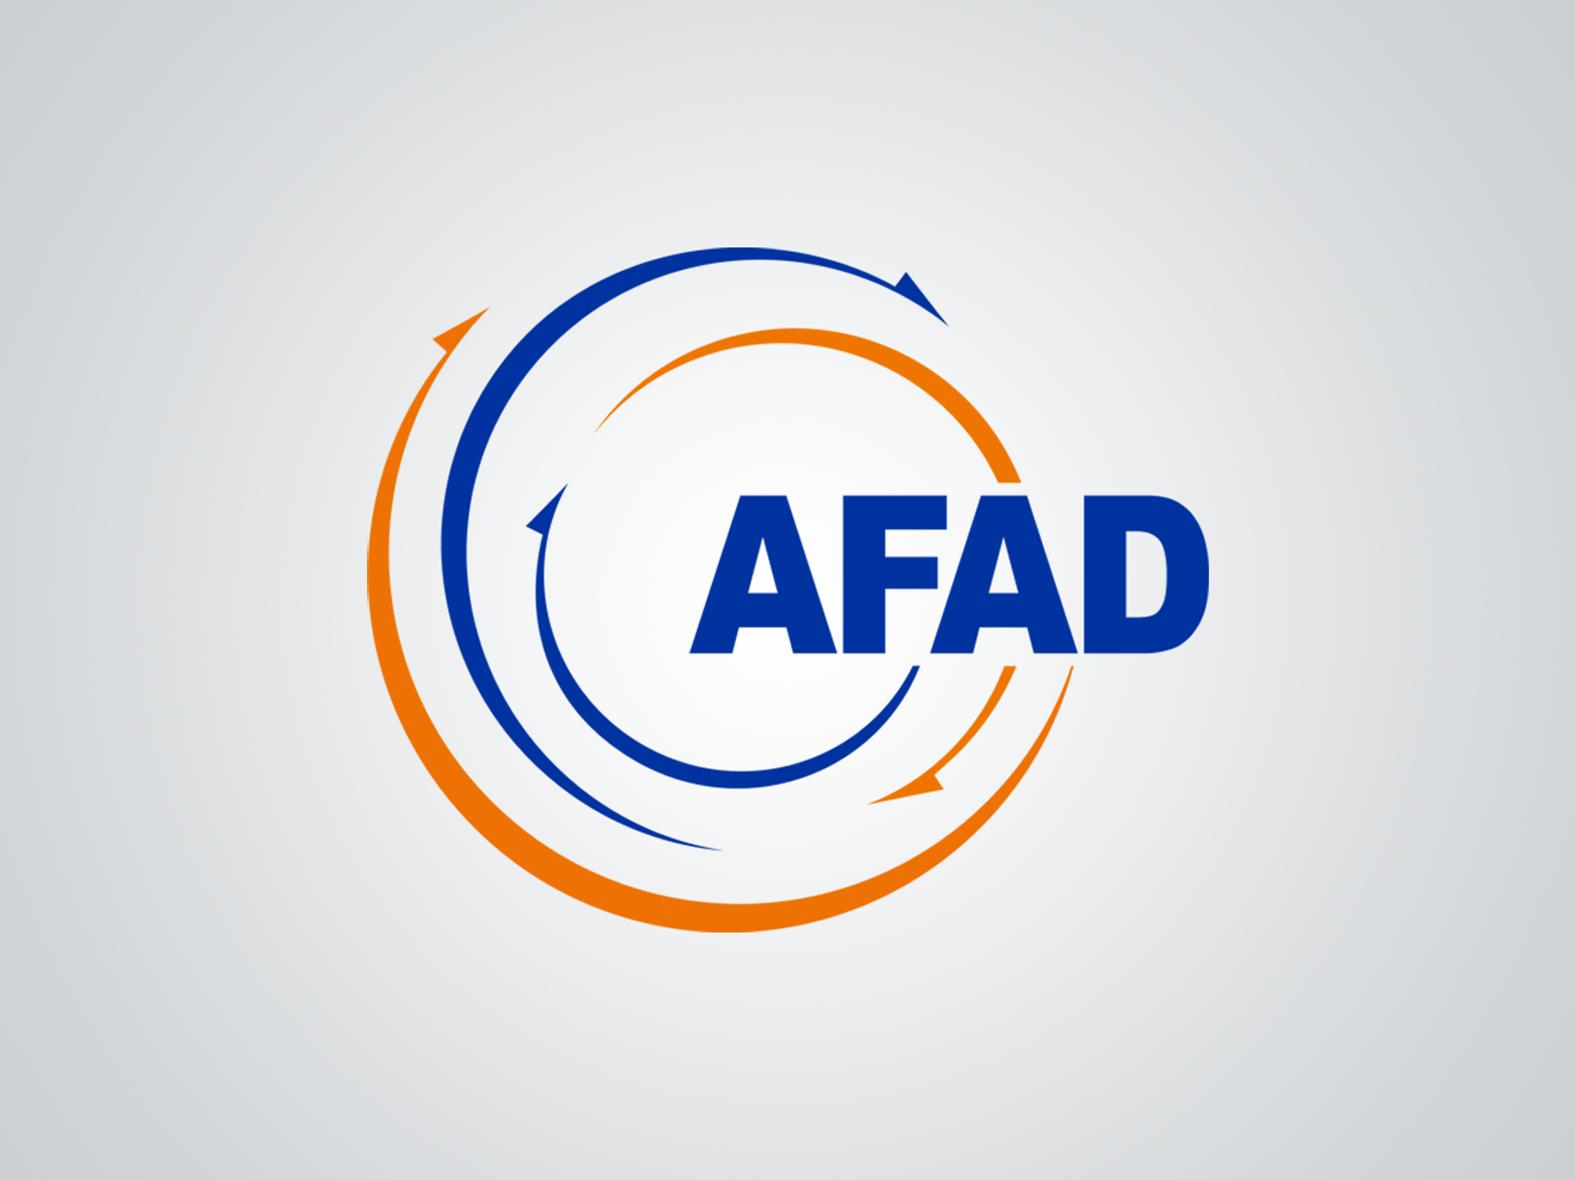 Afad LYS